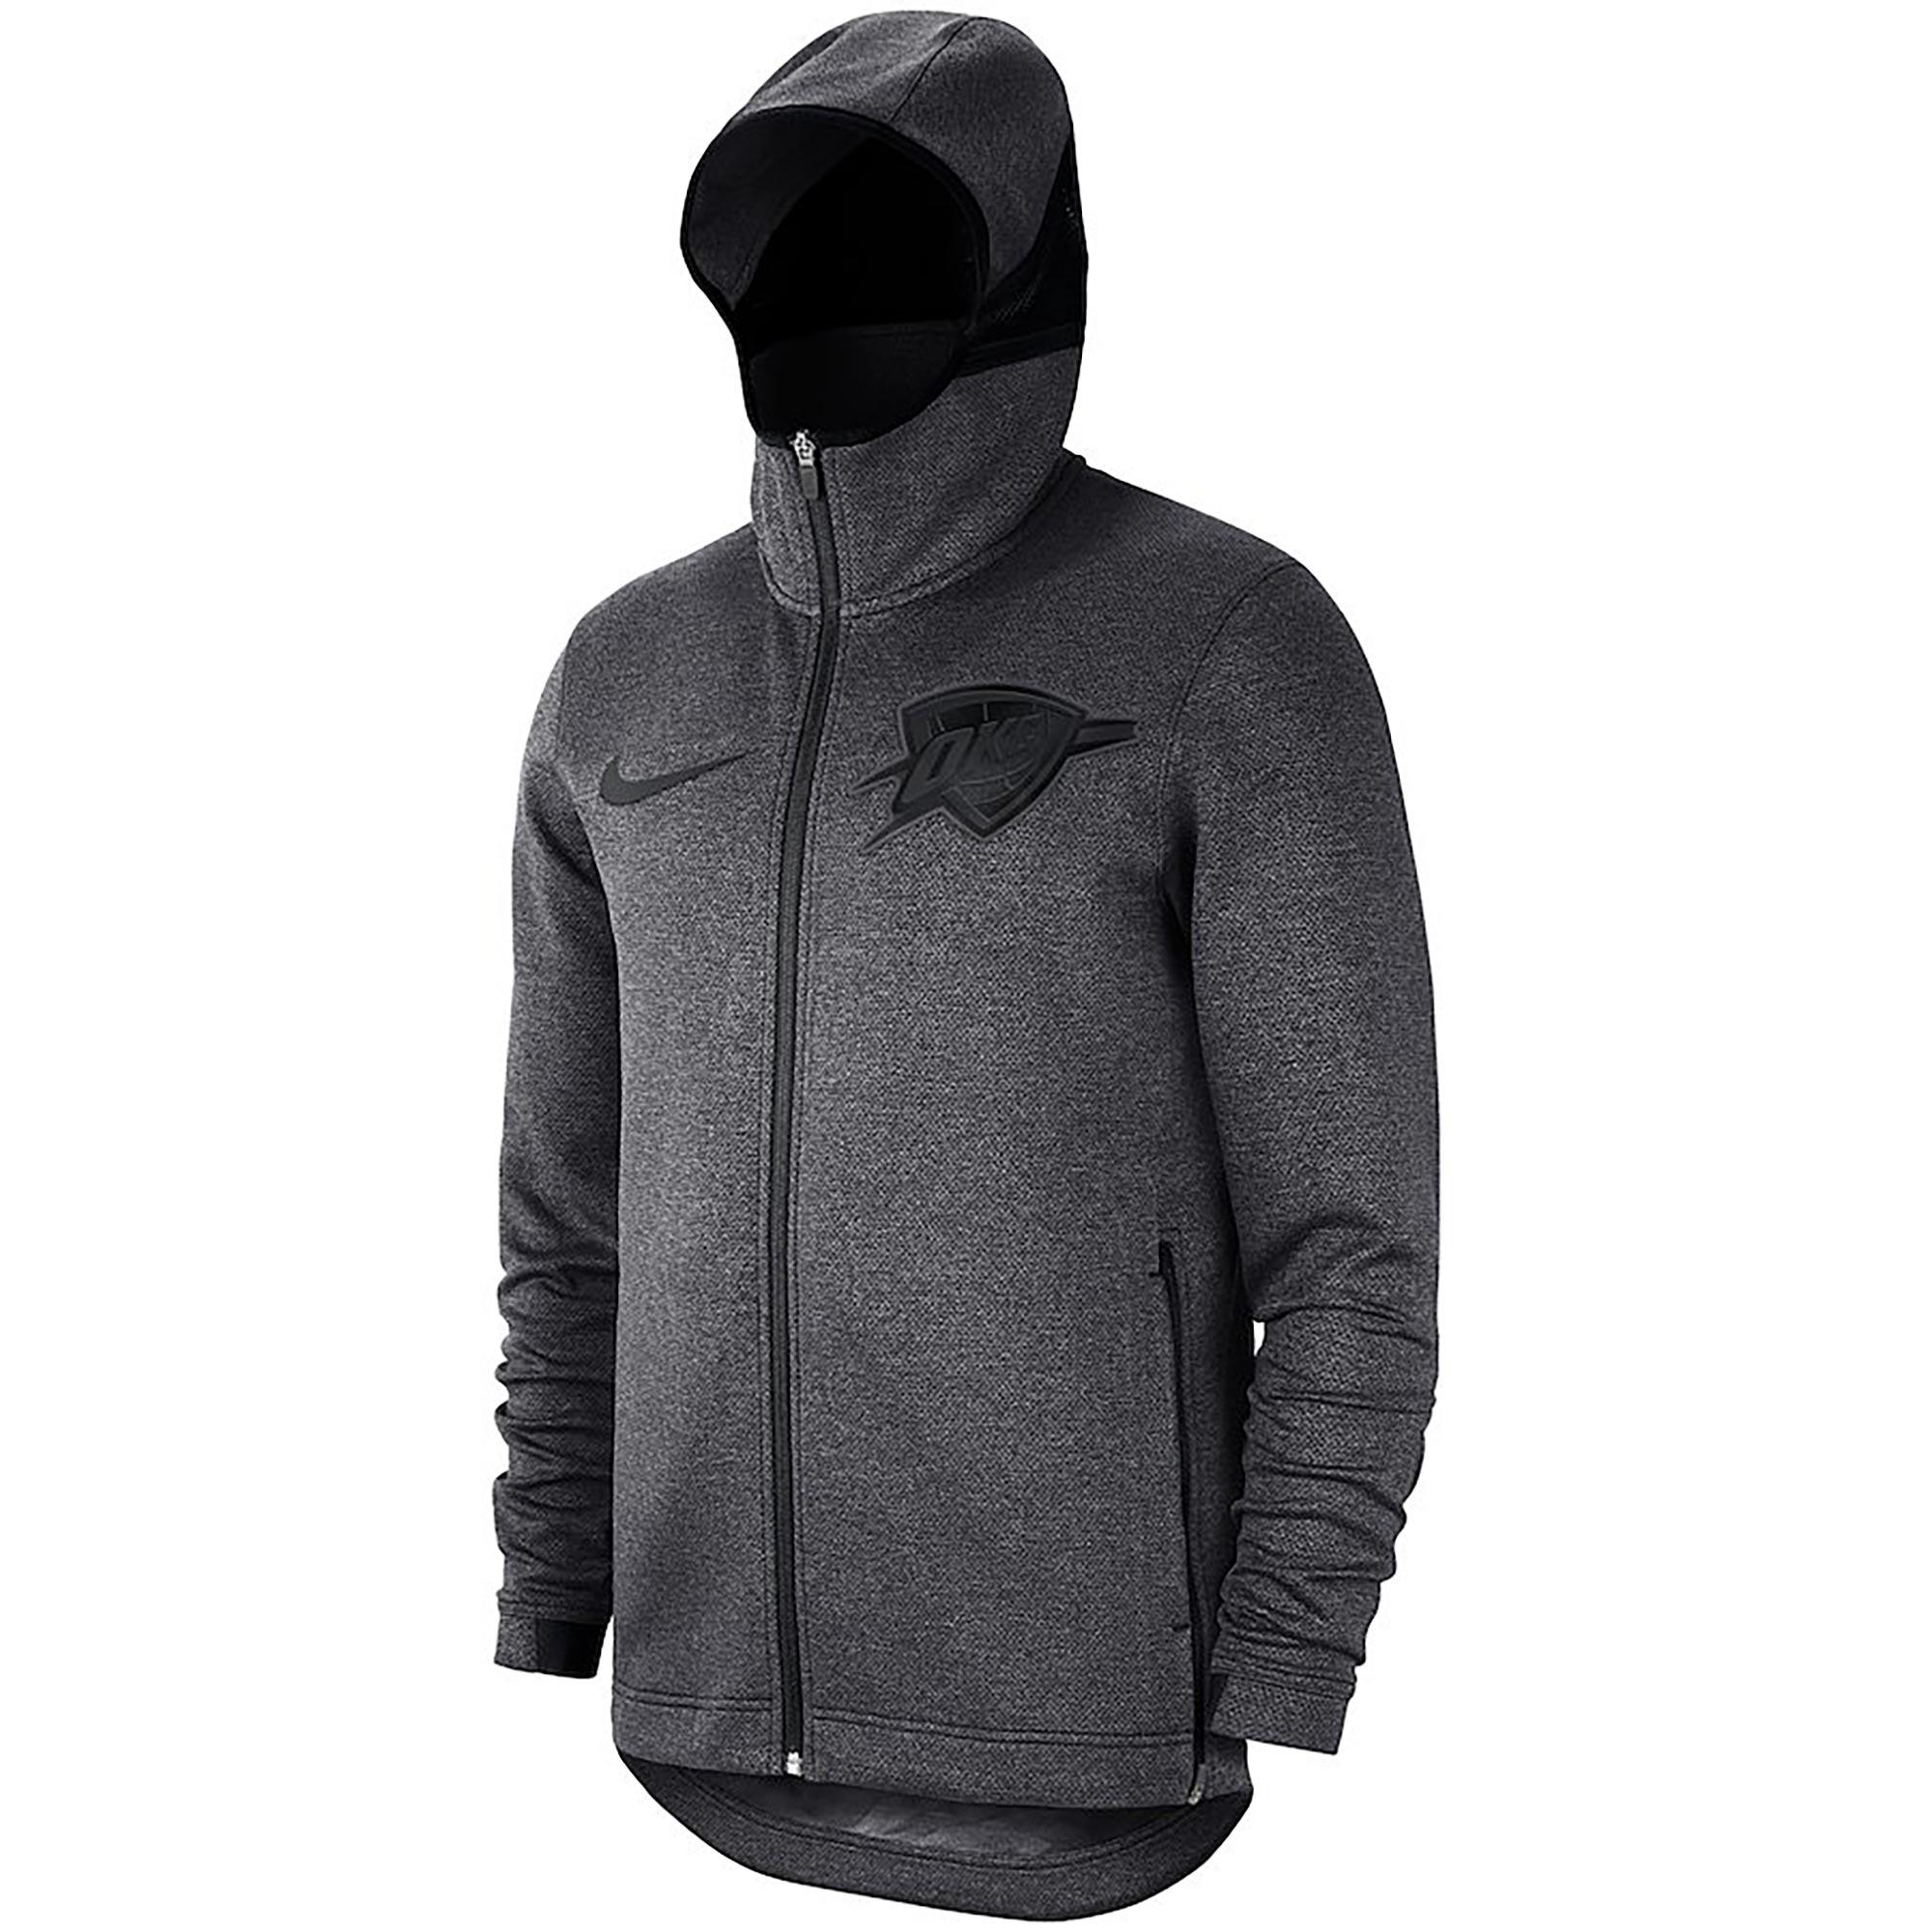 Outerstuff EMEA Ltd / Oklahoma City Thunder Nike Showtime Therma Flex Hoodie - Youth